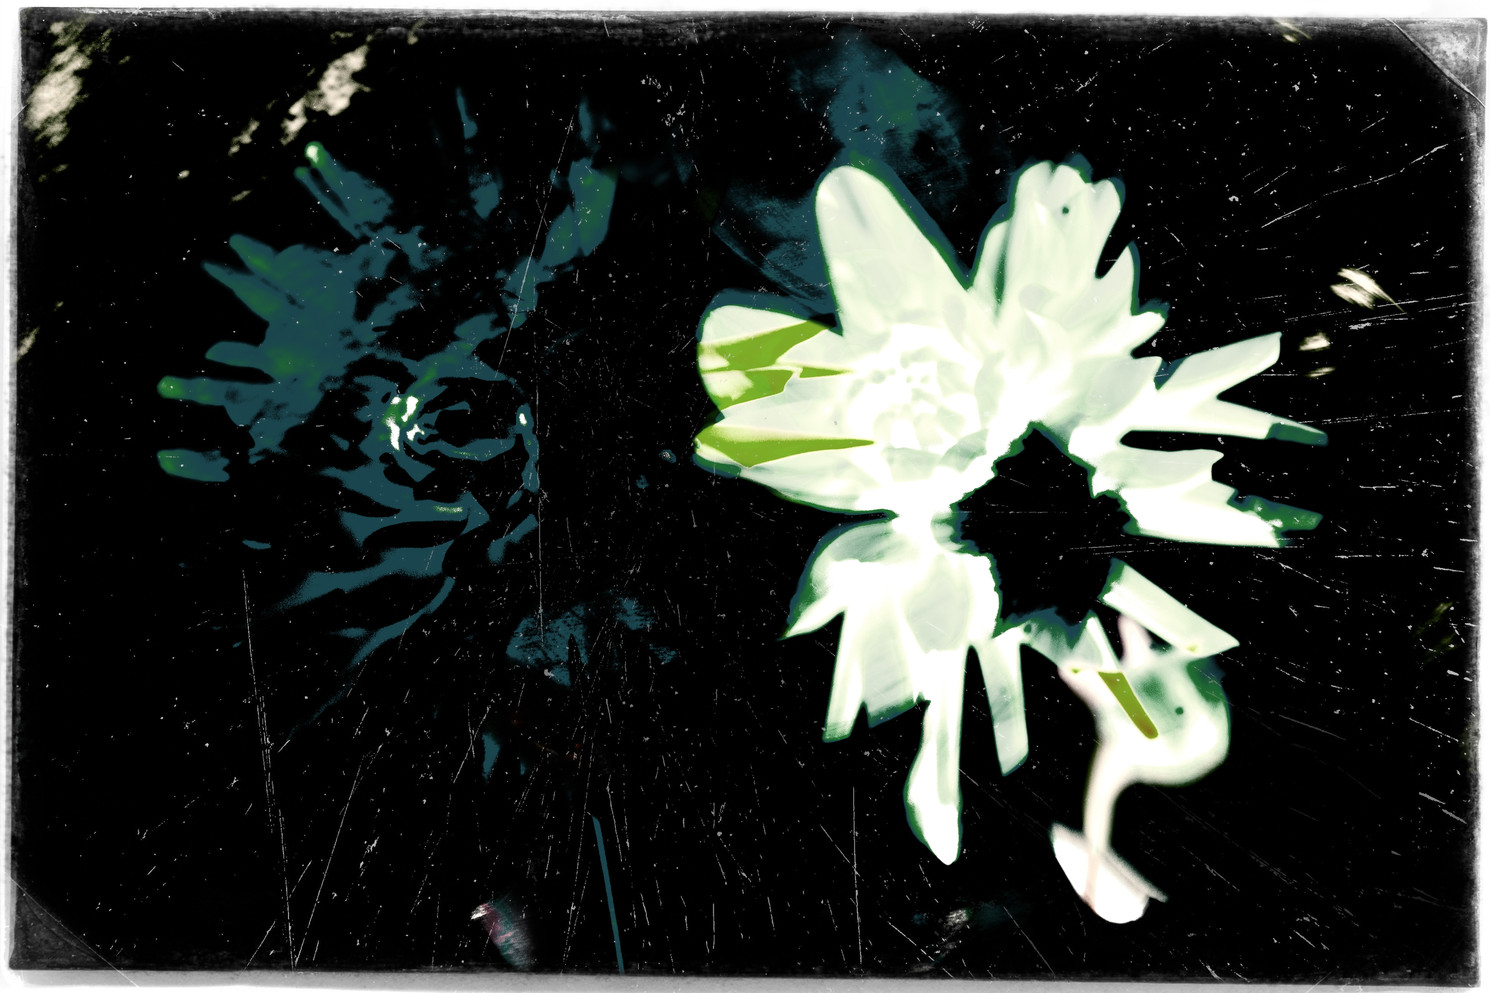 The Garden of Persephone 046